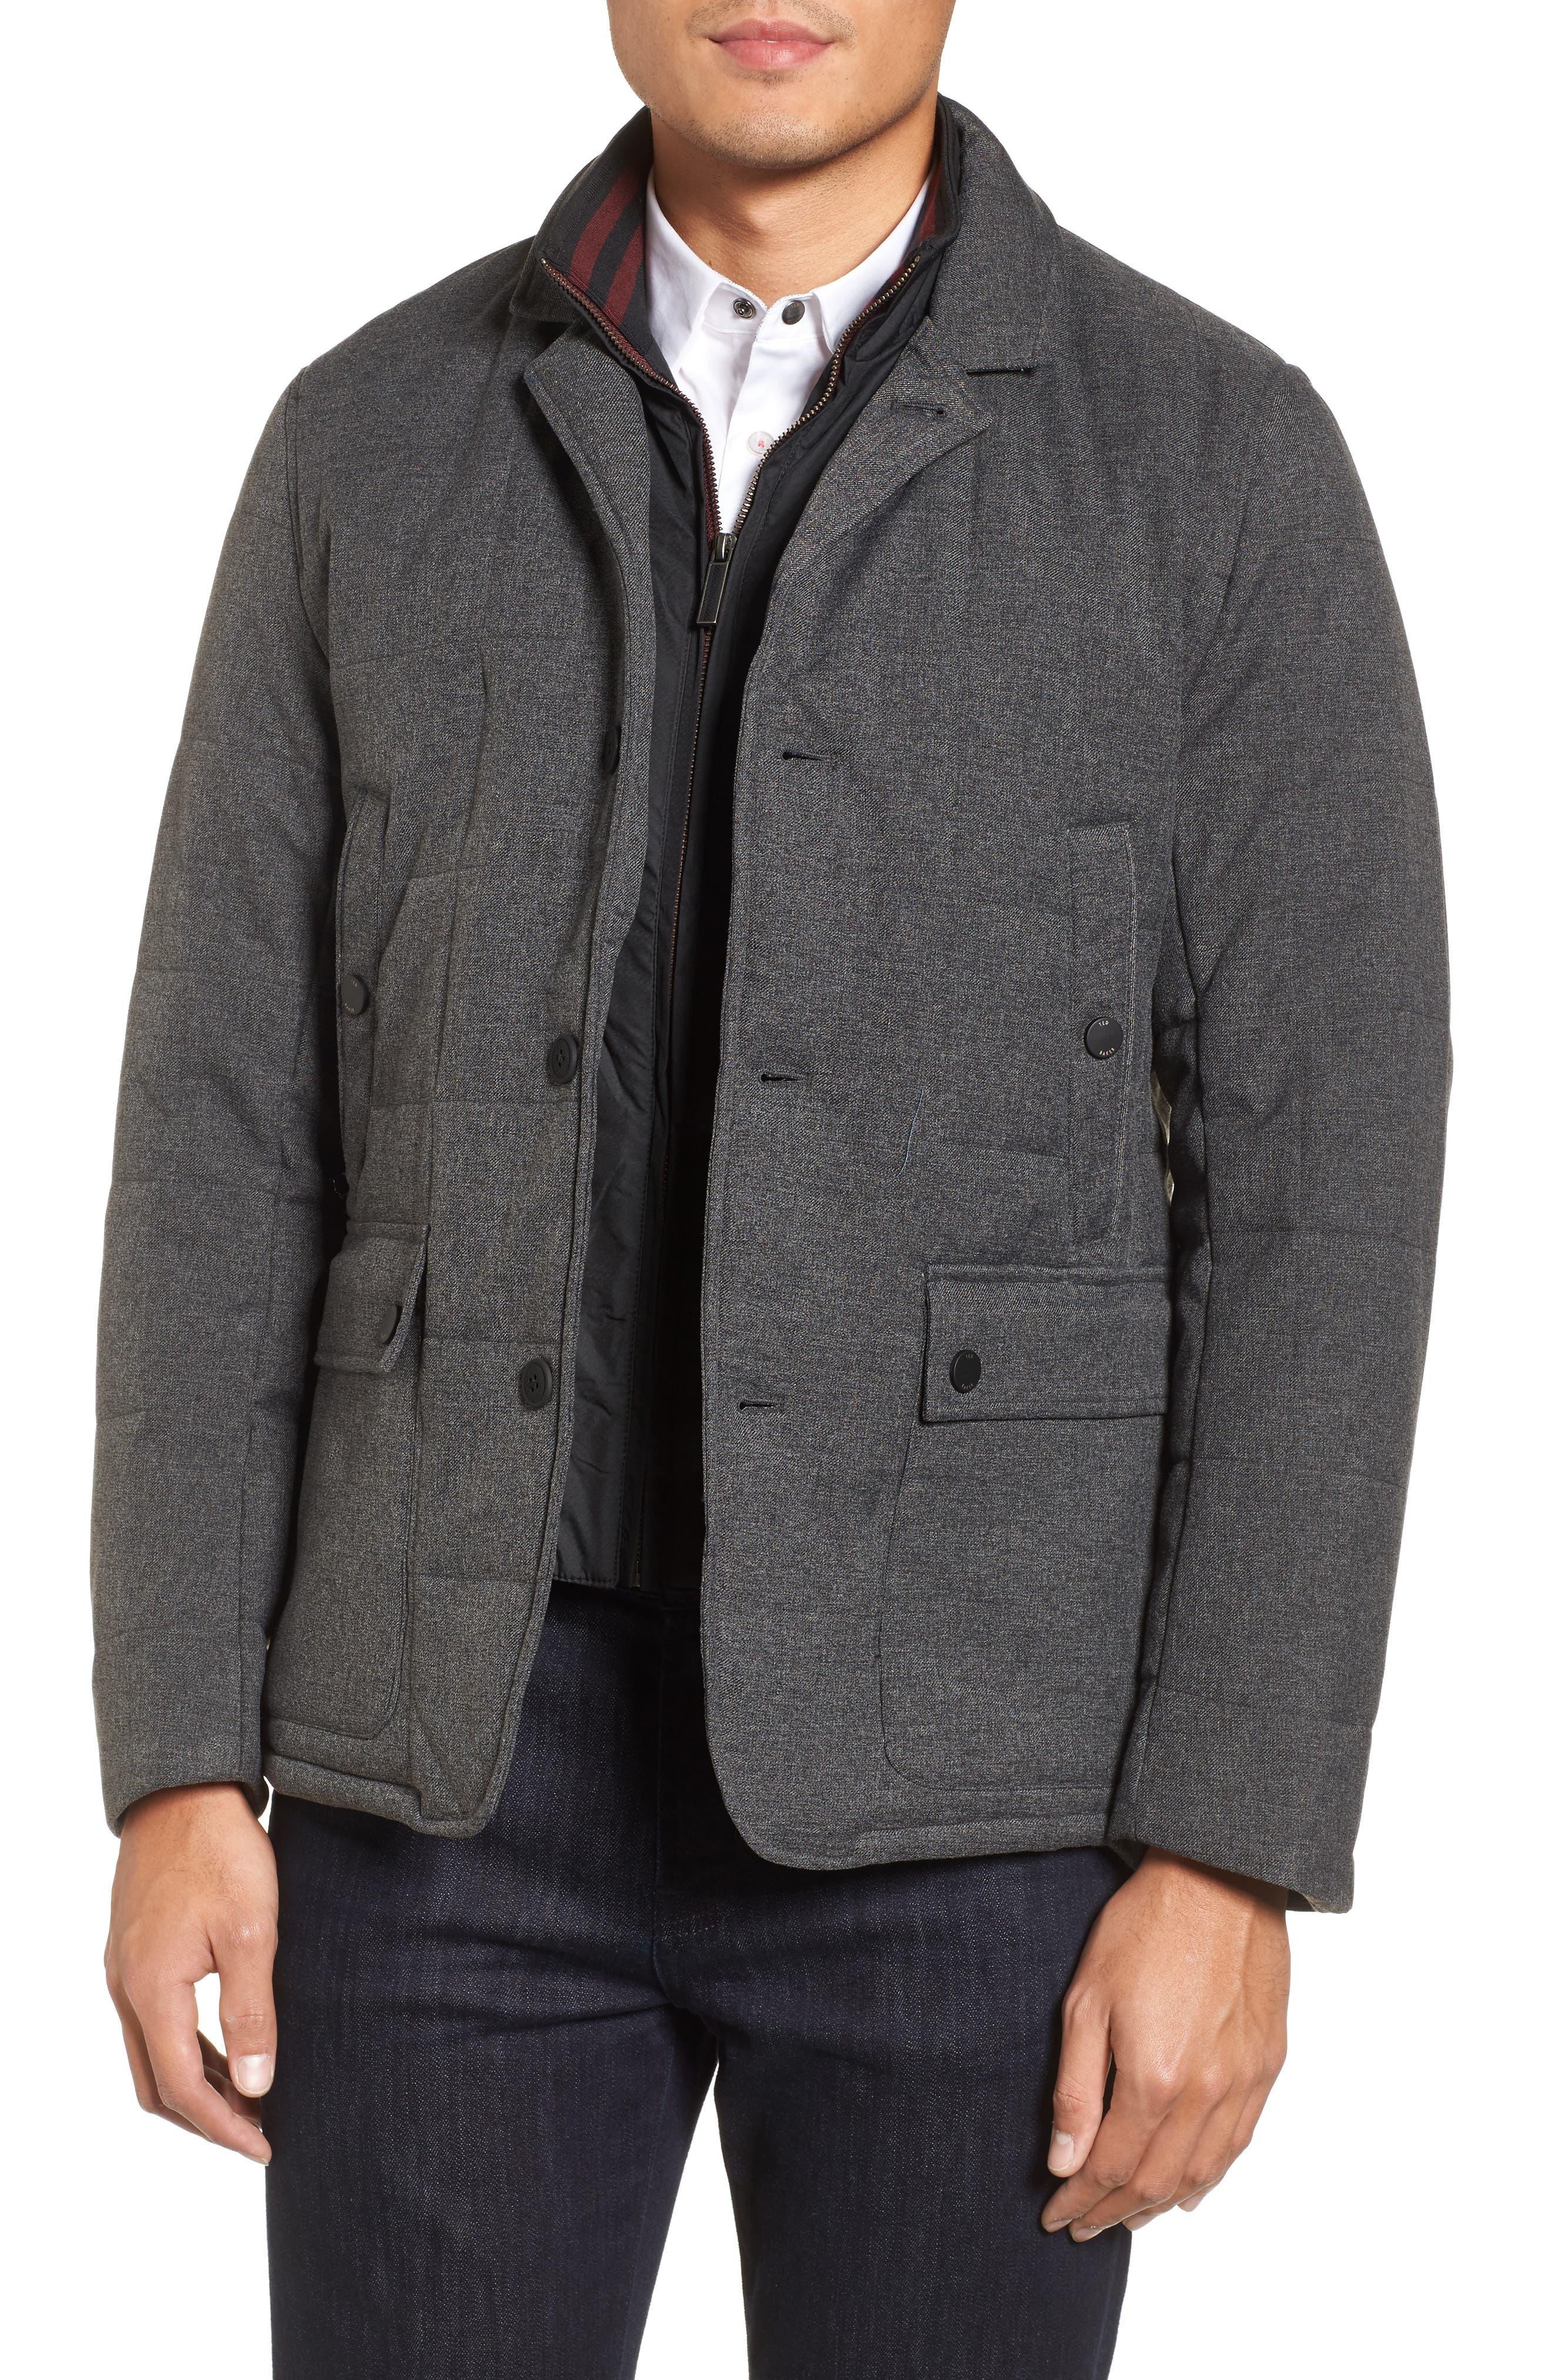 Jaycie Inset Bib Quilted Jacket,                         Main,                         color, Grey